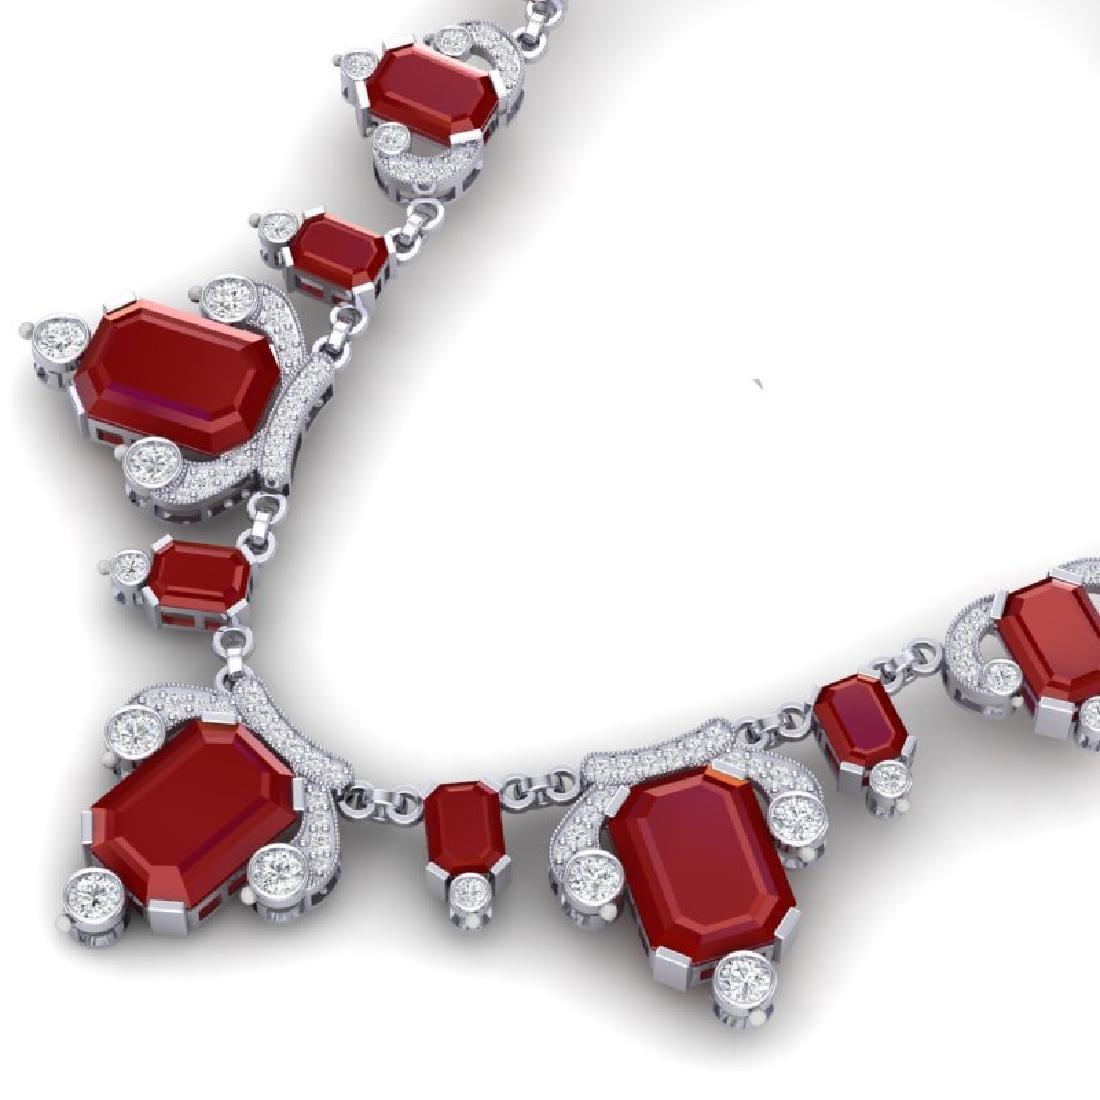 75.21 CTW Royalty Ruby & VS Diamond Necklace 18K White - 2